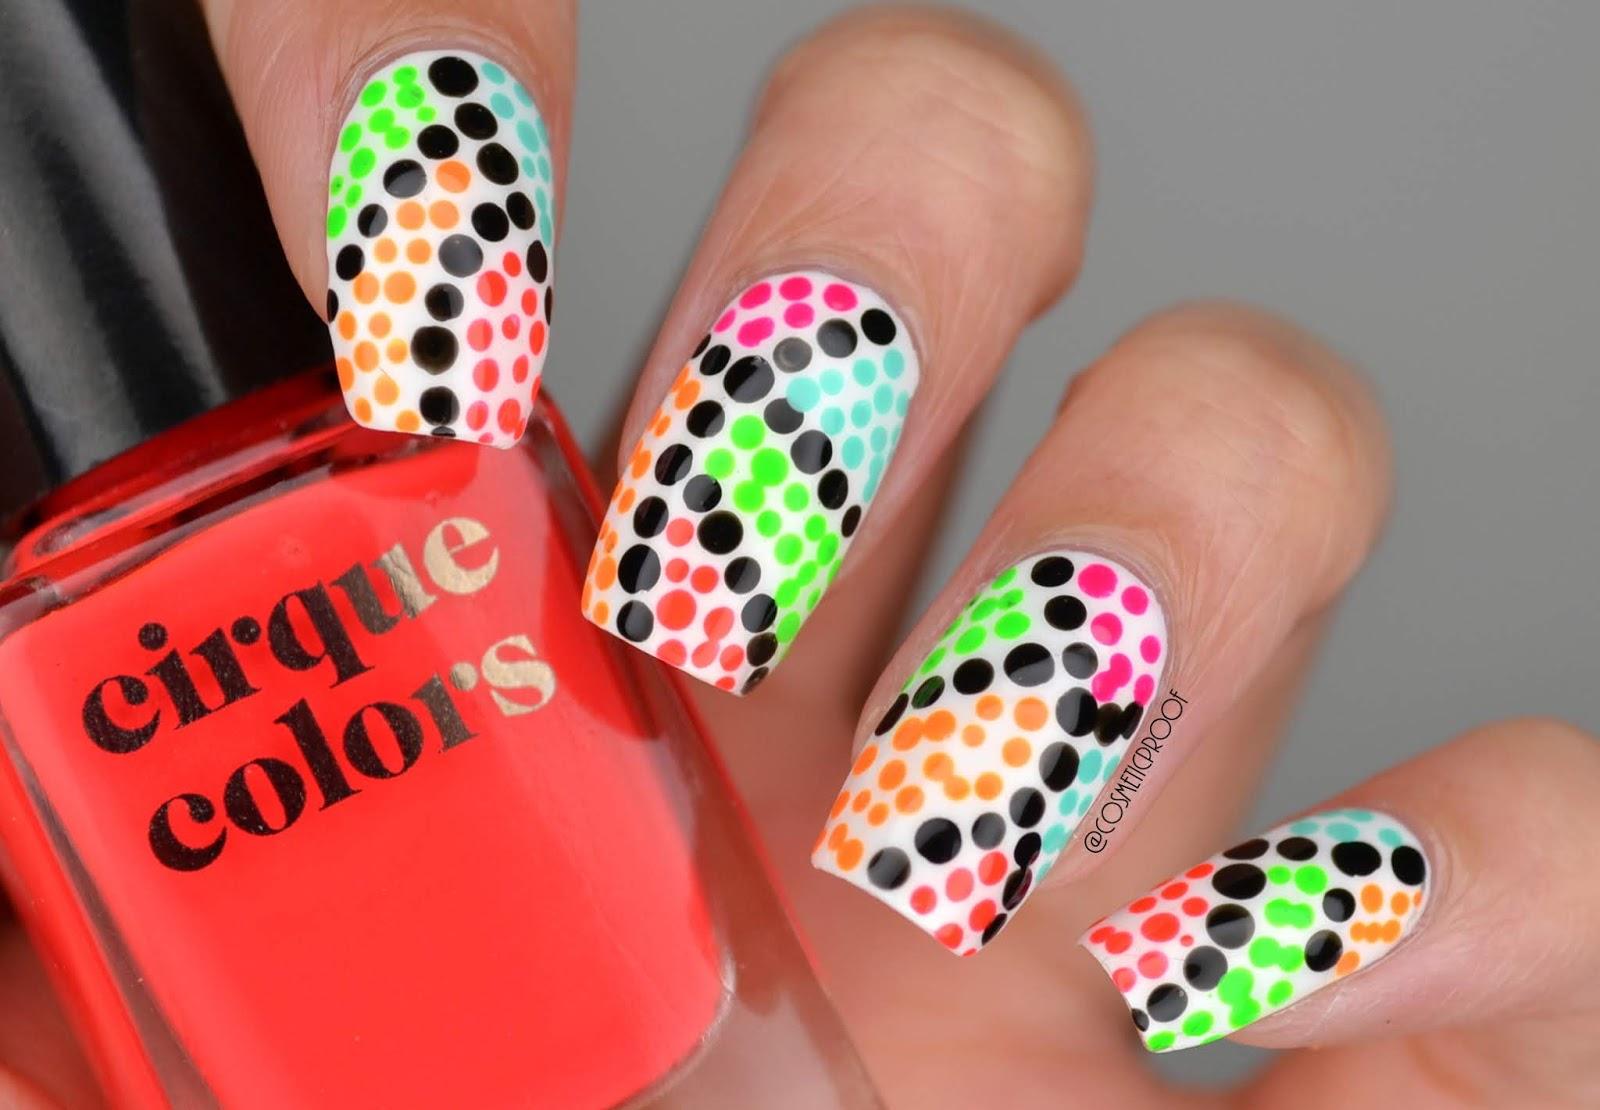 Nails The Neon Dotticure Cbbxmanimonday Cosmetic Proof